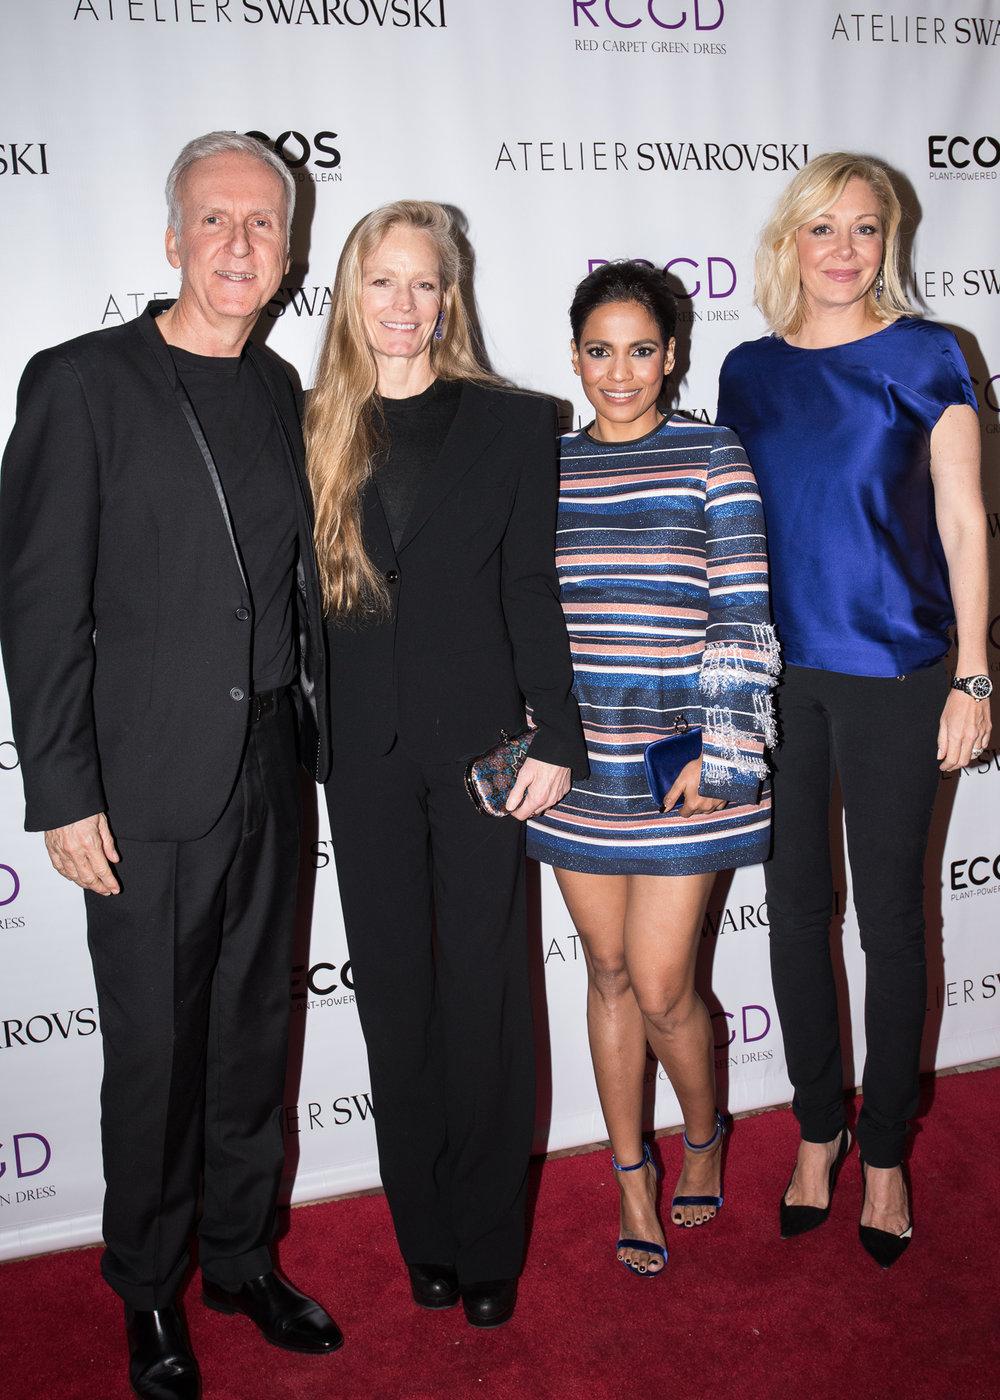 James Cameron, Suzy Amis Cameron, Priyanka Bose and Nadja Swarovski.